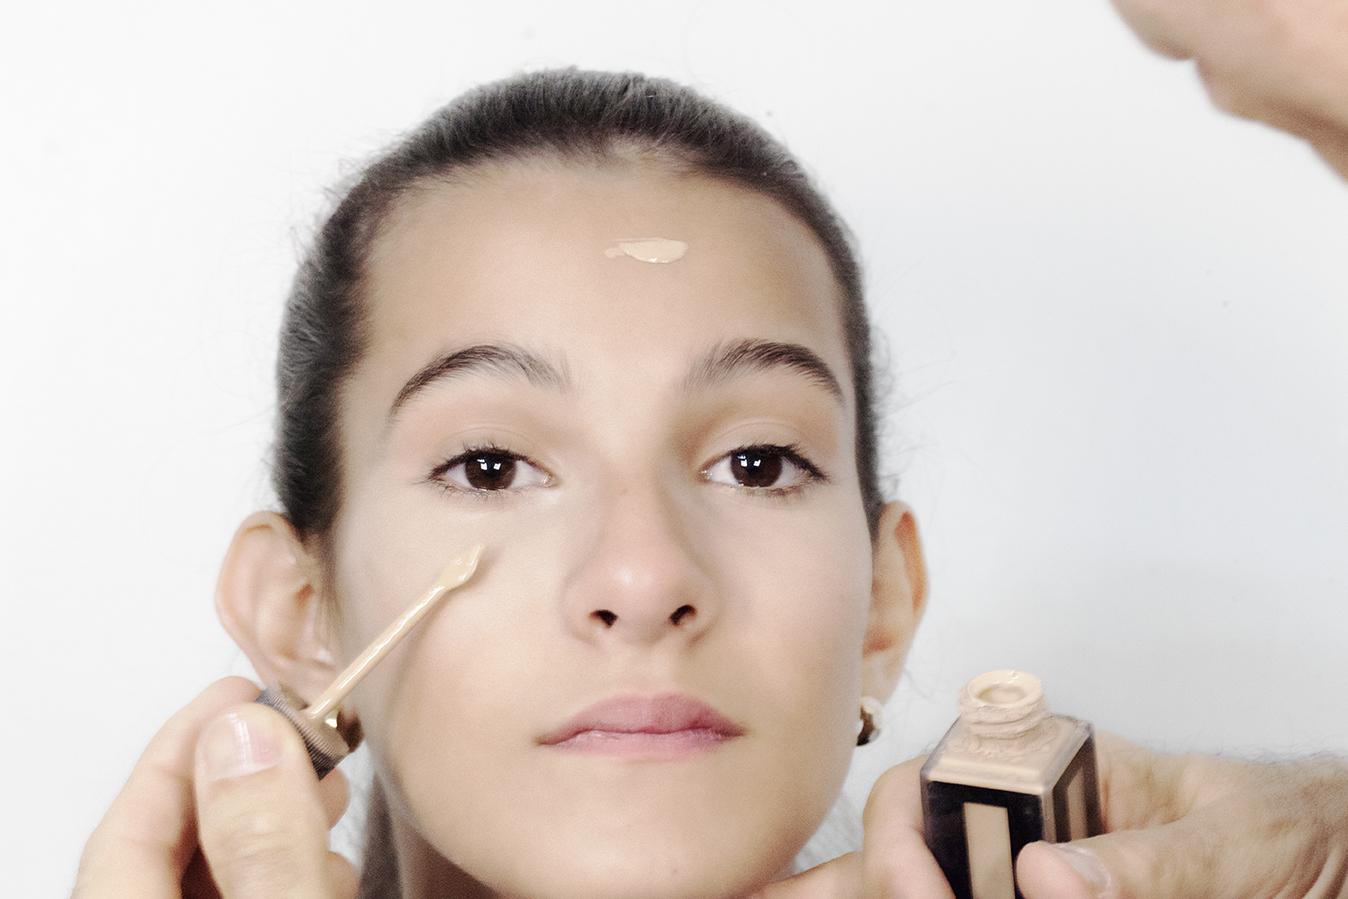 Base de maquillaje